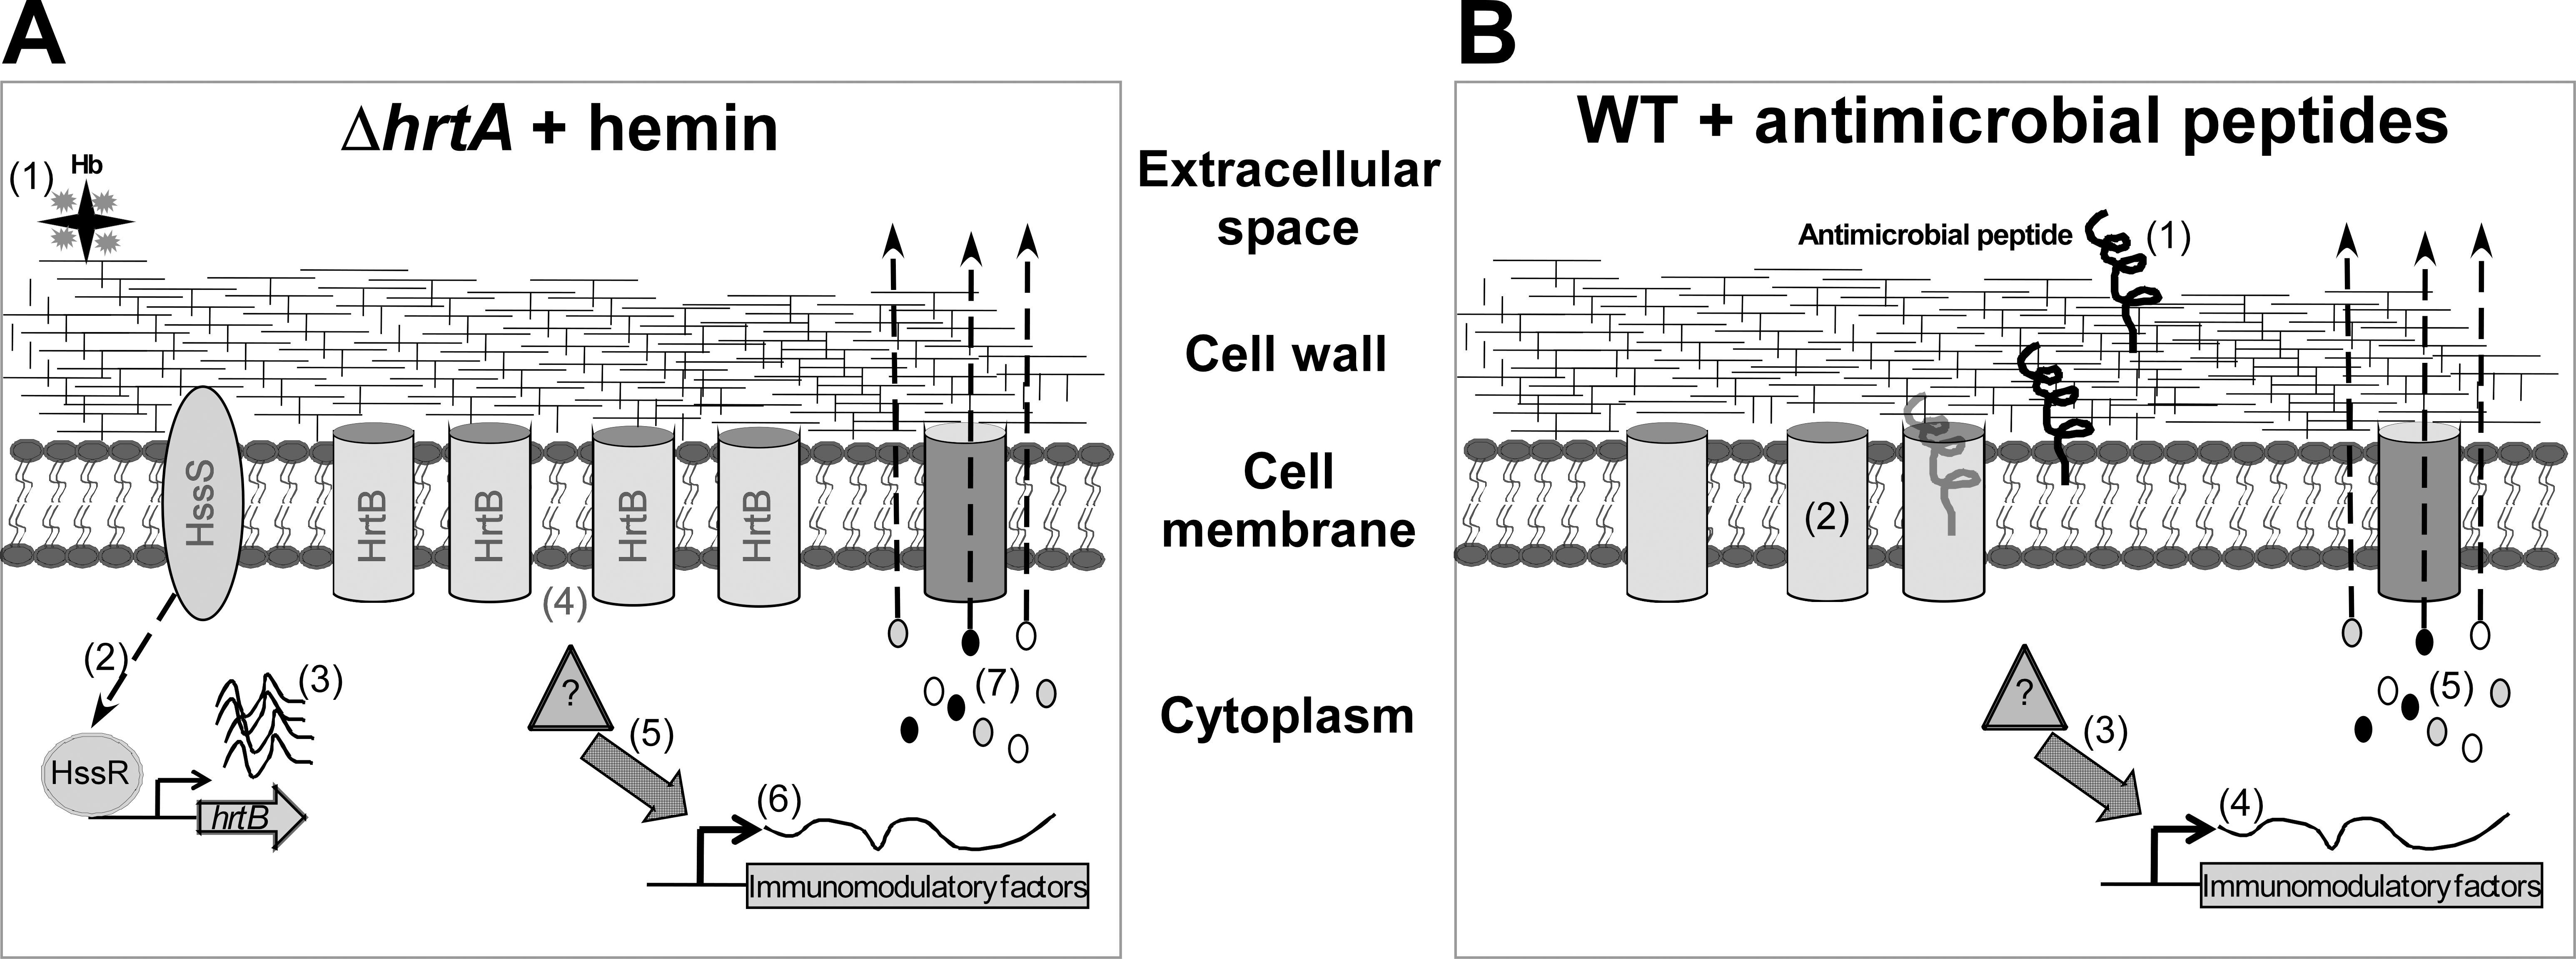 Membrane damage triggers immunomodulatory proteins secretion.